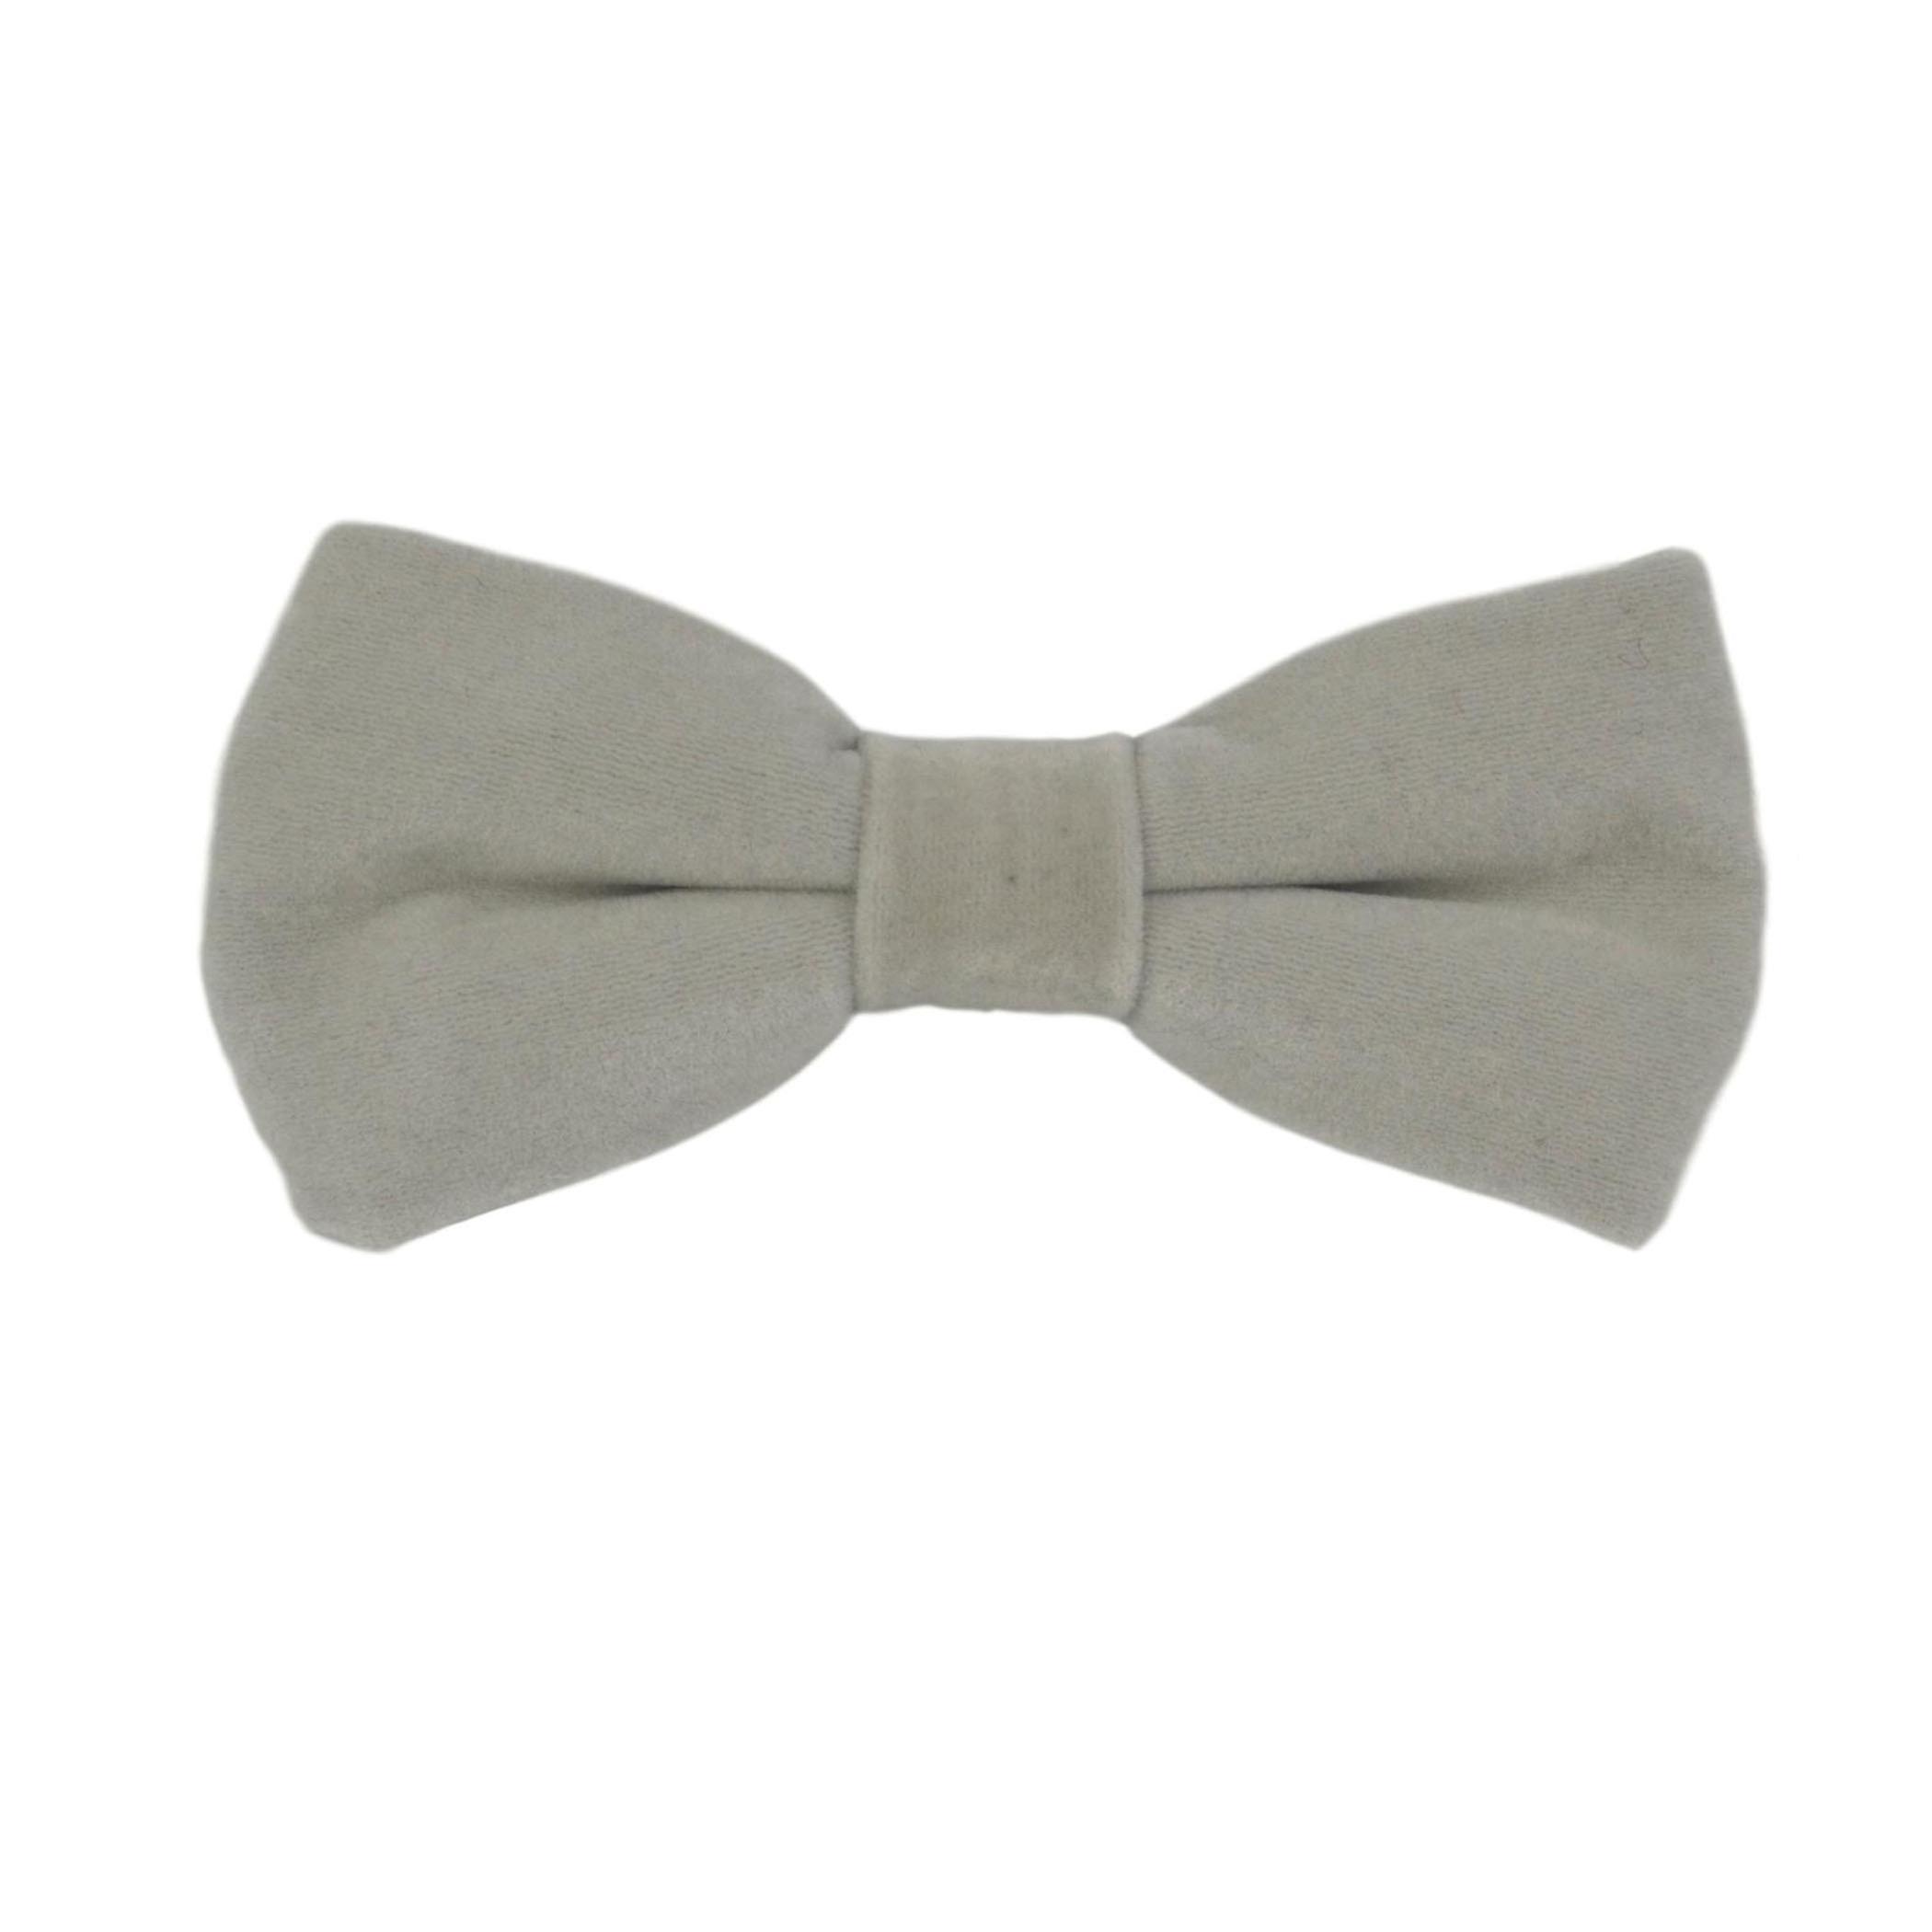 Luxury Silver Oyster Grey Velvet Bow Tie & Pocket Square Set